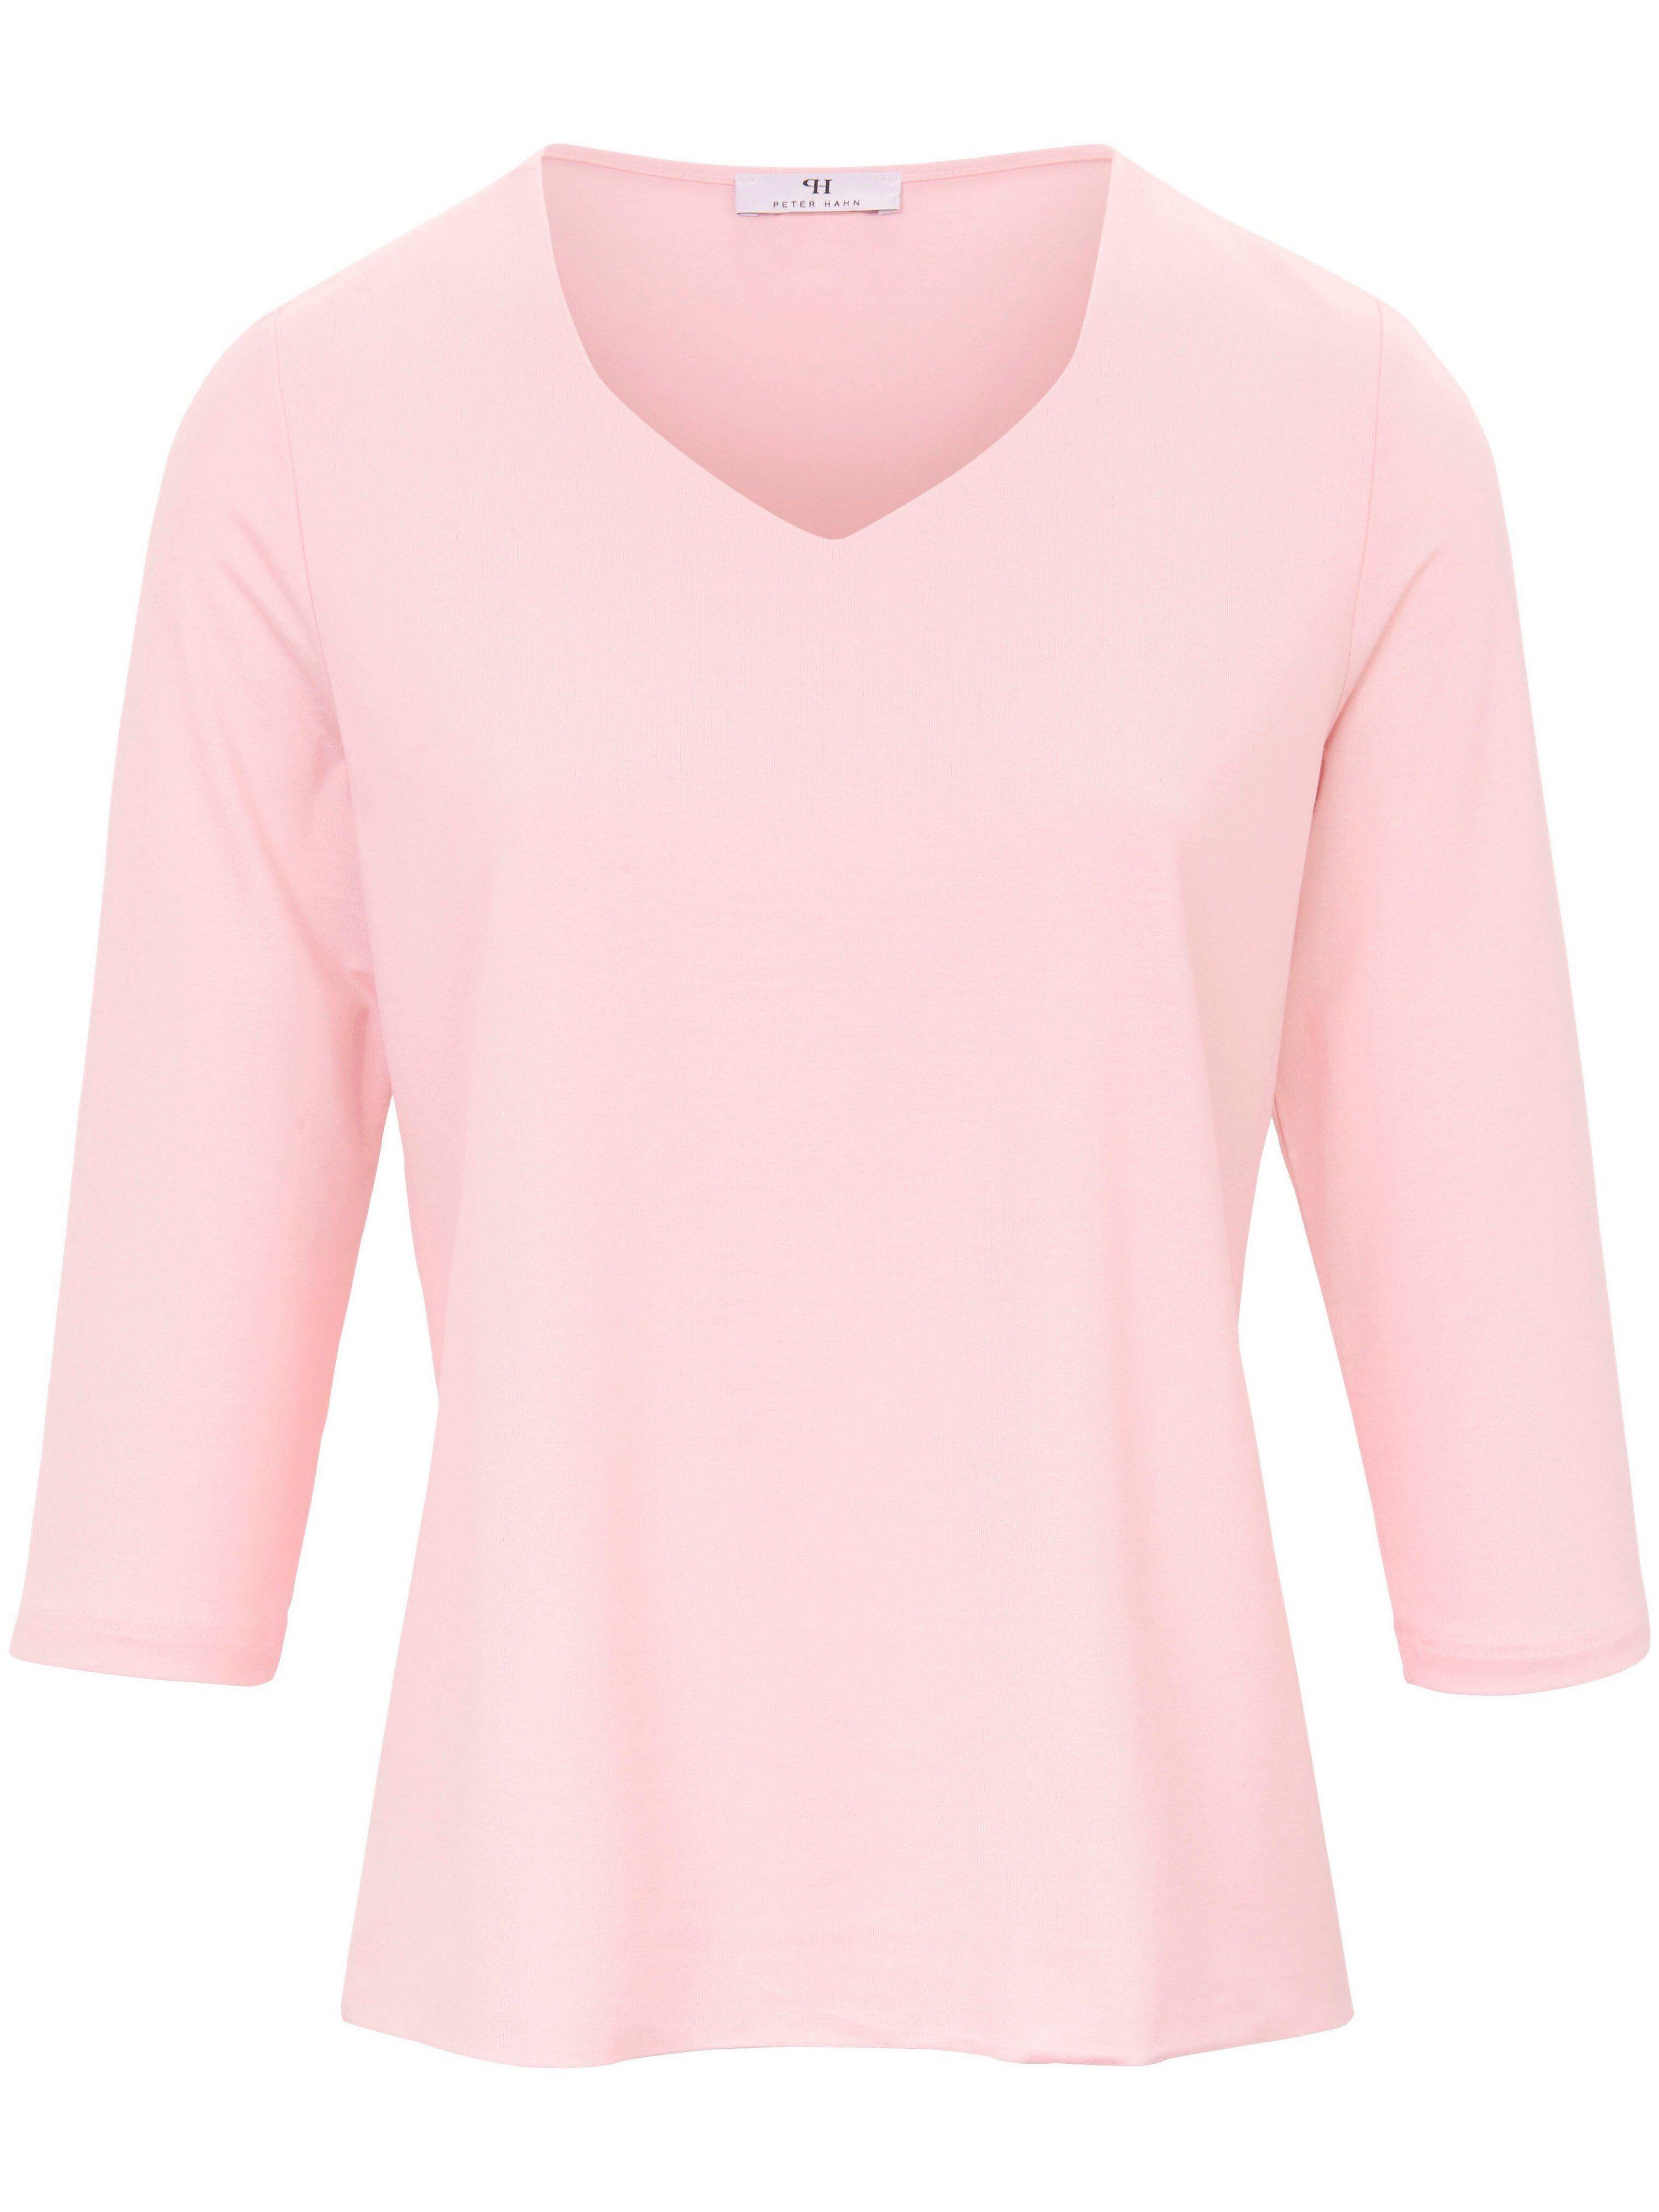 Peter Hahn Le T-shirt manches 3/4  Peter Hahn rose  - Femme - 38